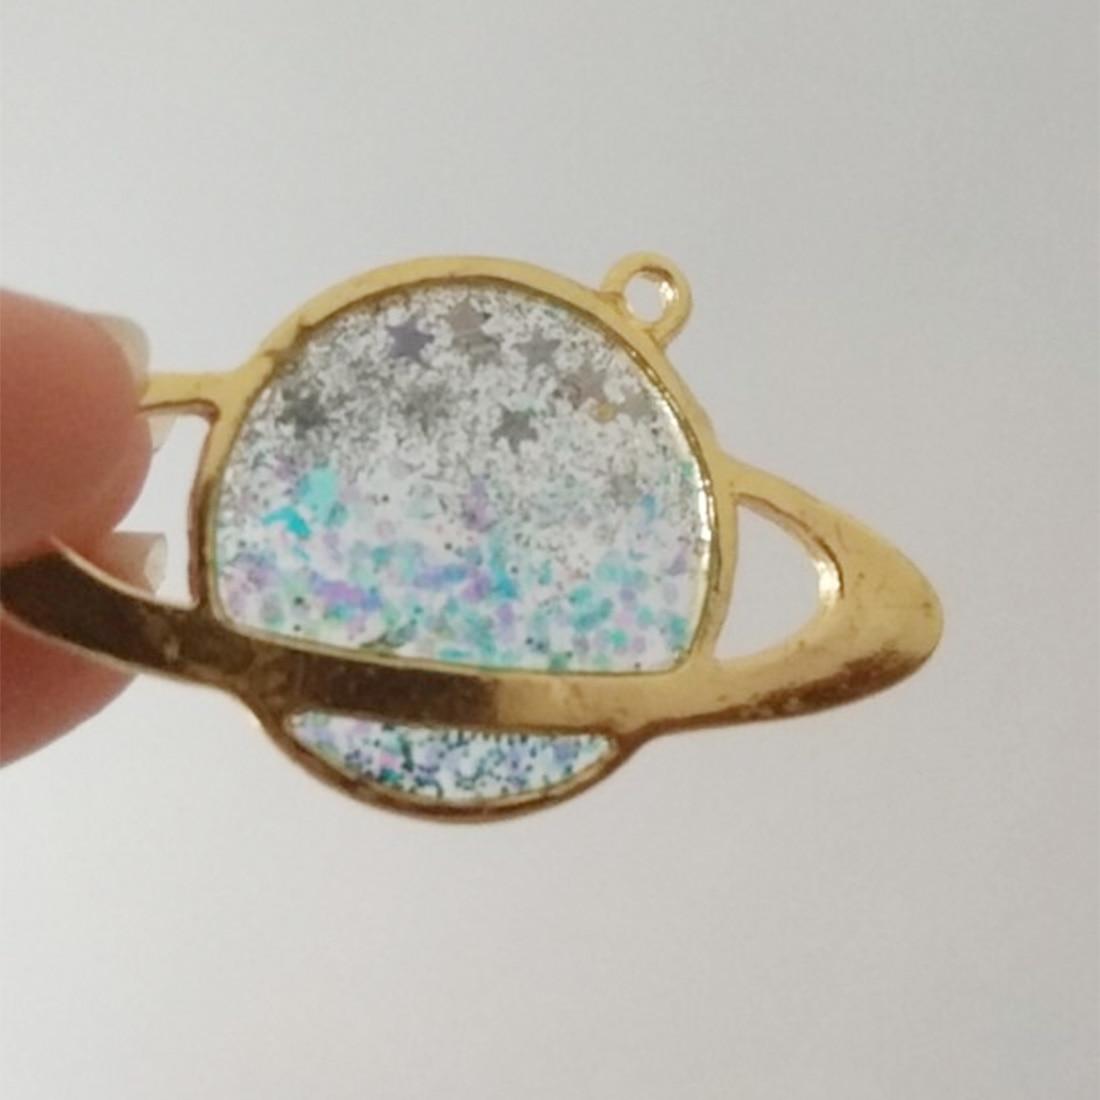 5Pcs UV Pendant Open Bezel Setting Resin Earring Jewelry DIY Accessories